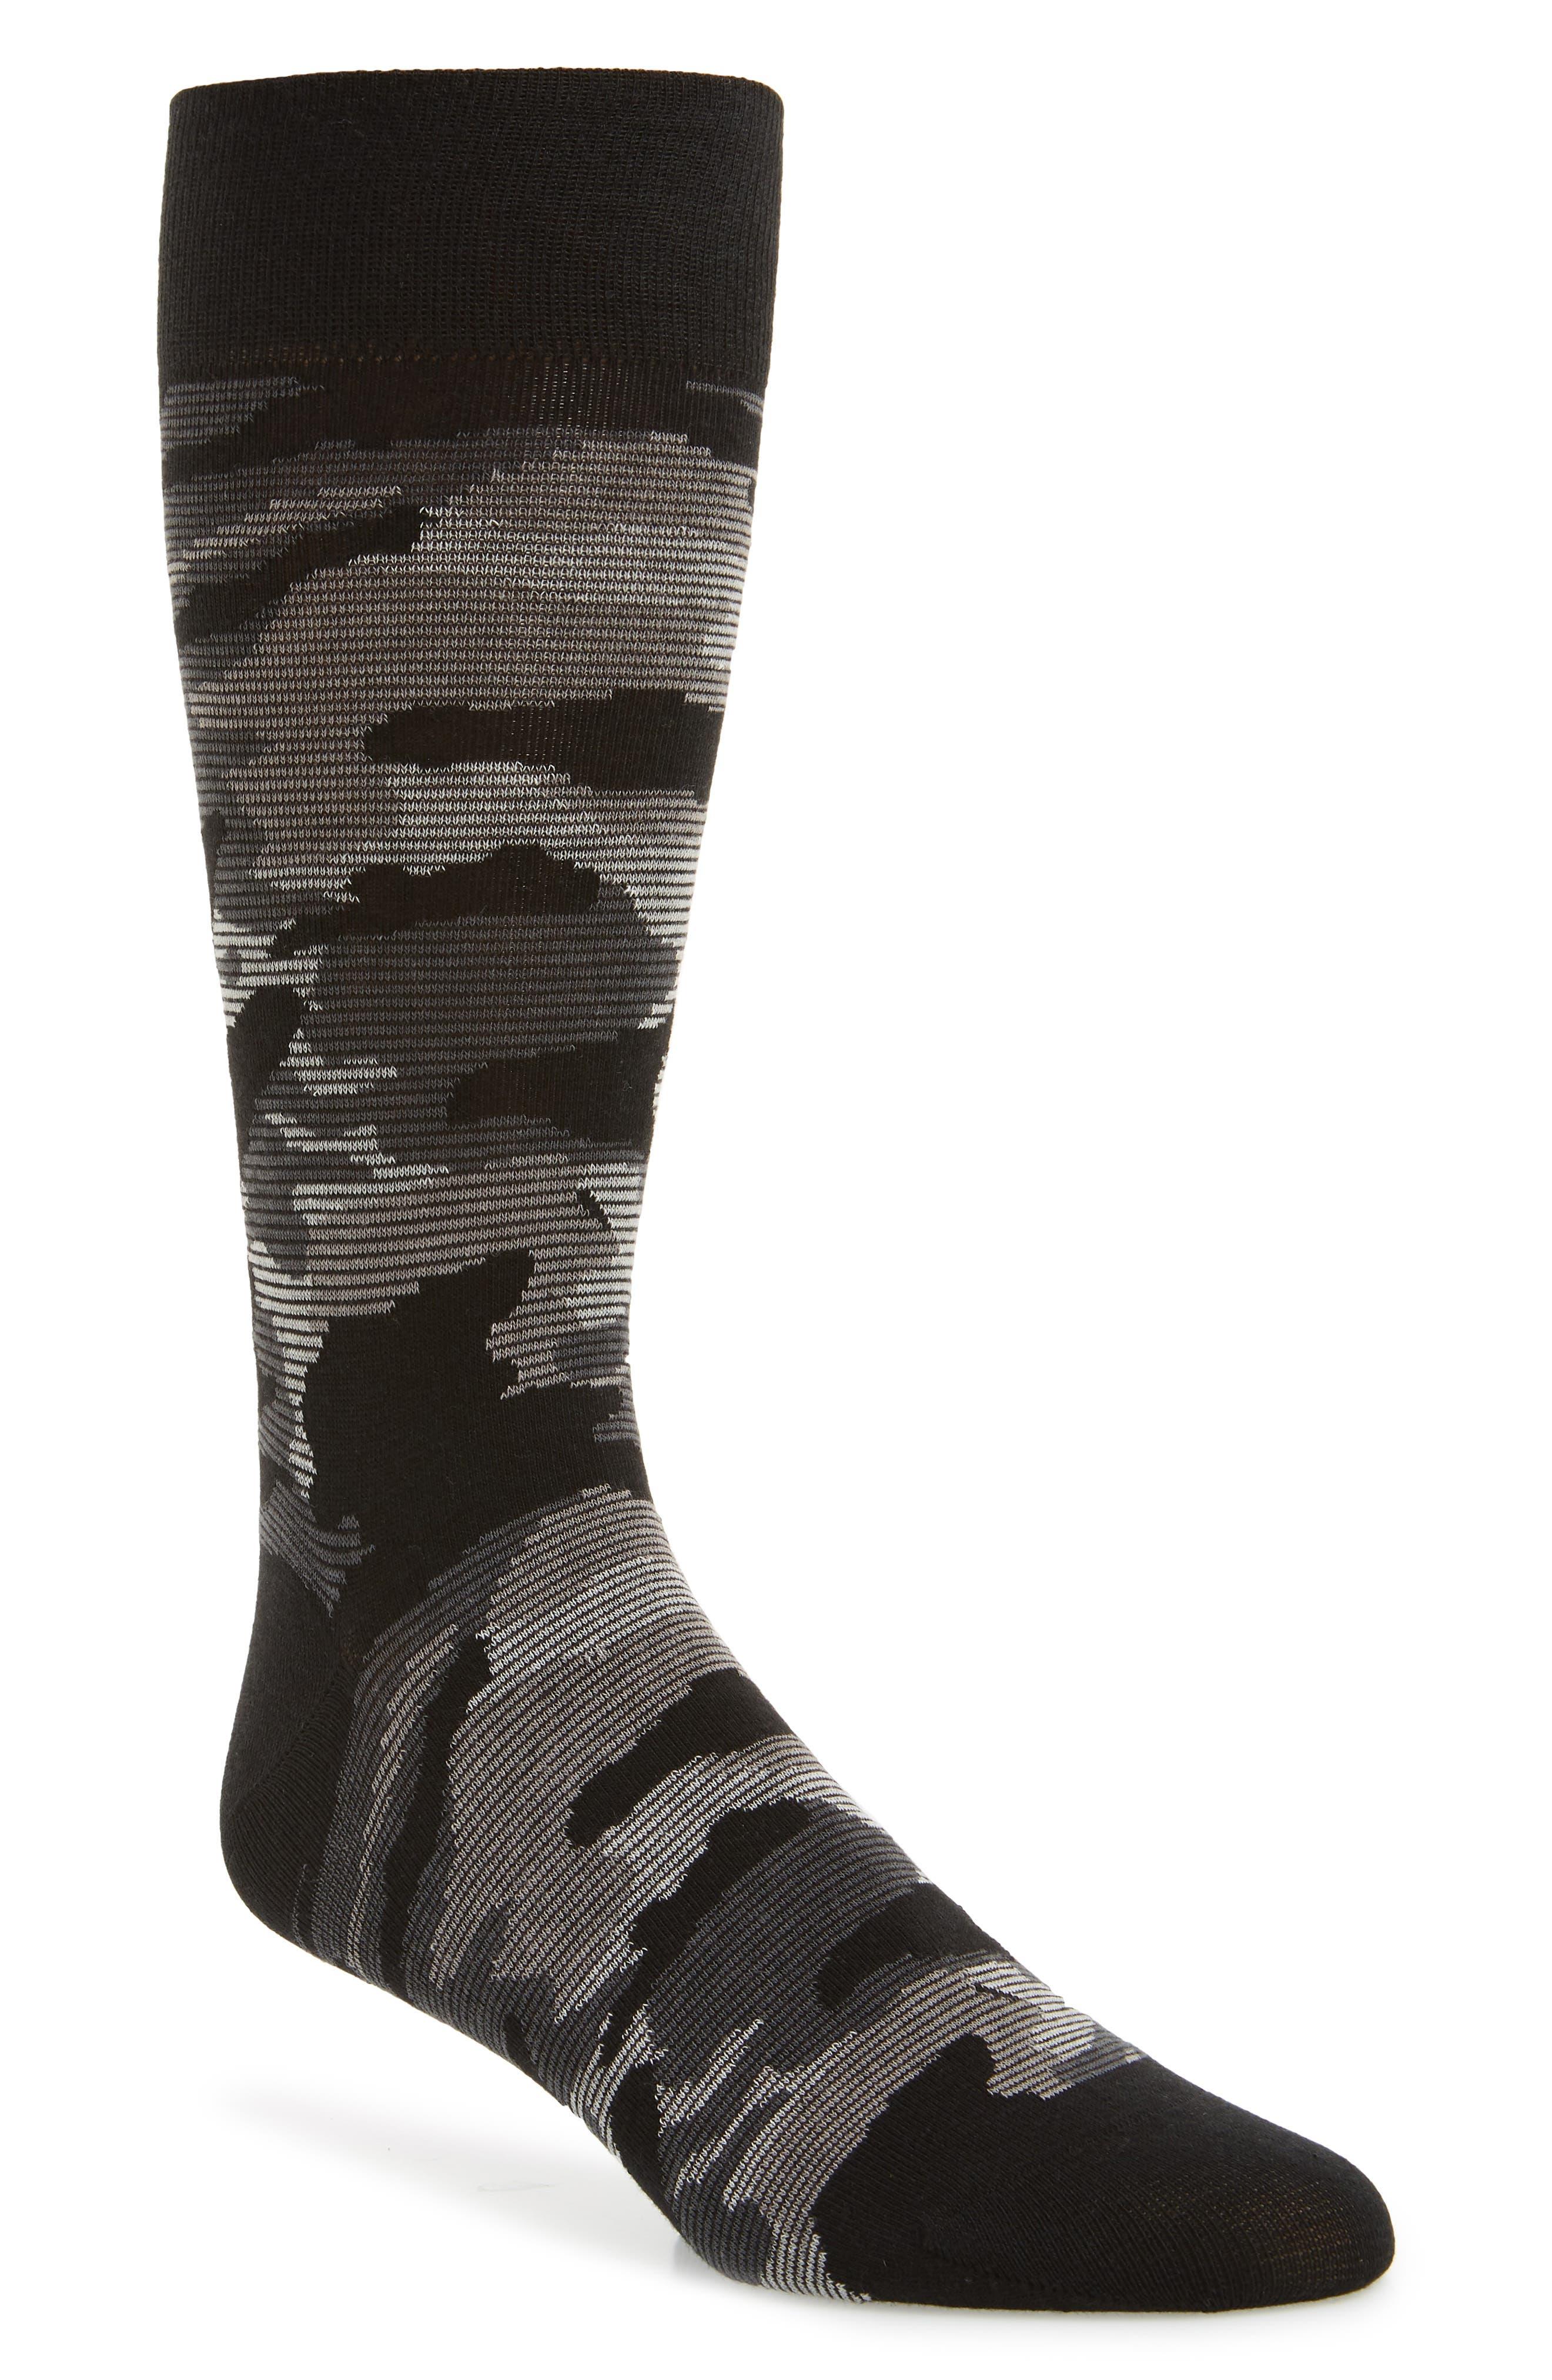 Modern Camo Socks,                             Main thumbnail 1, color,                             BLACK